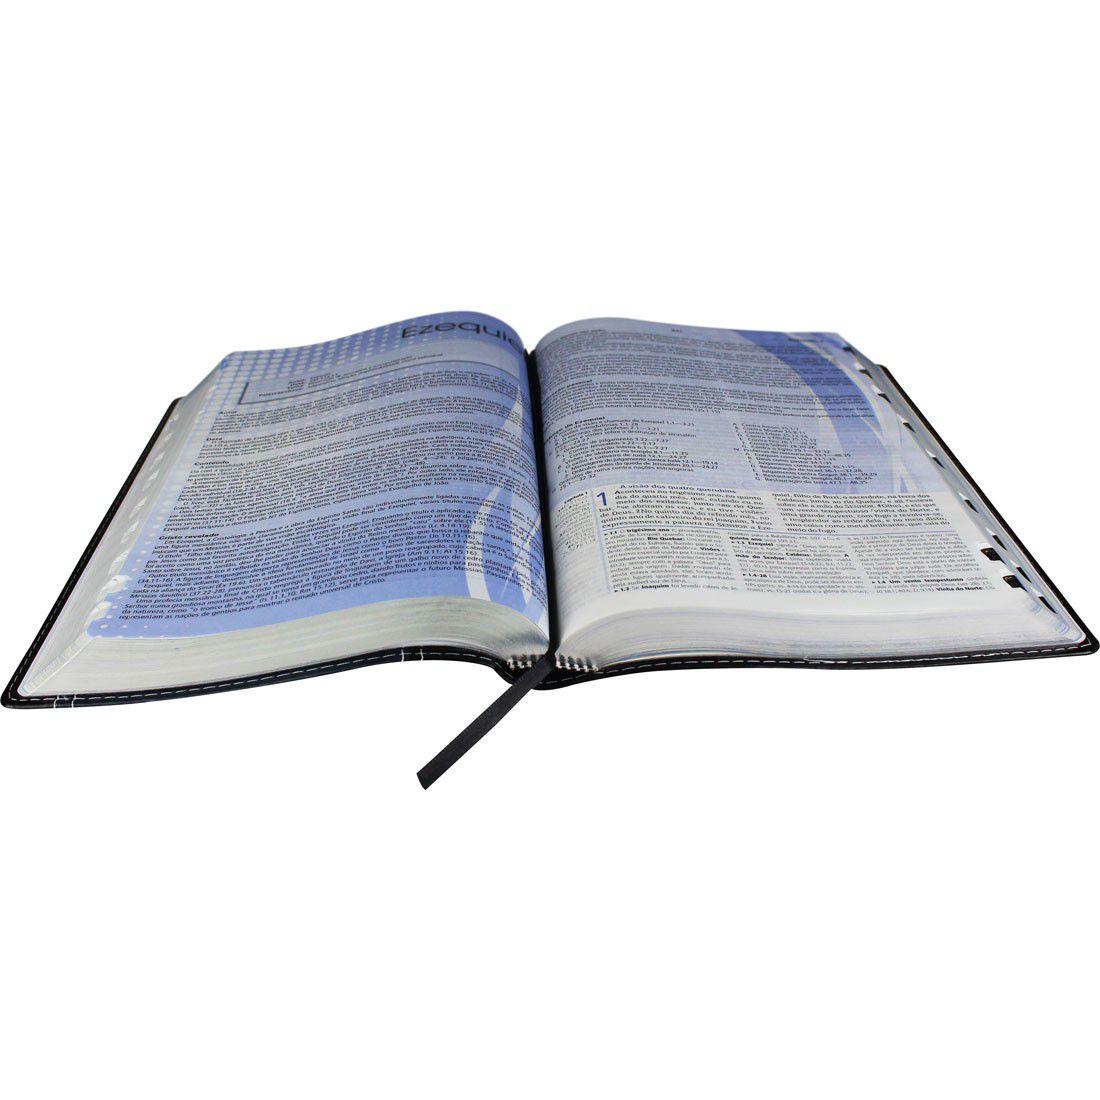 Bíblia de Estudo Plenitude ARA  - Livraria Betel